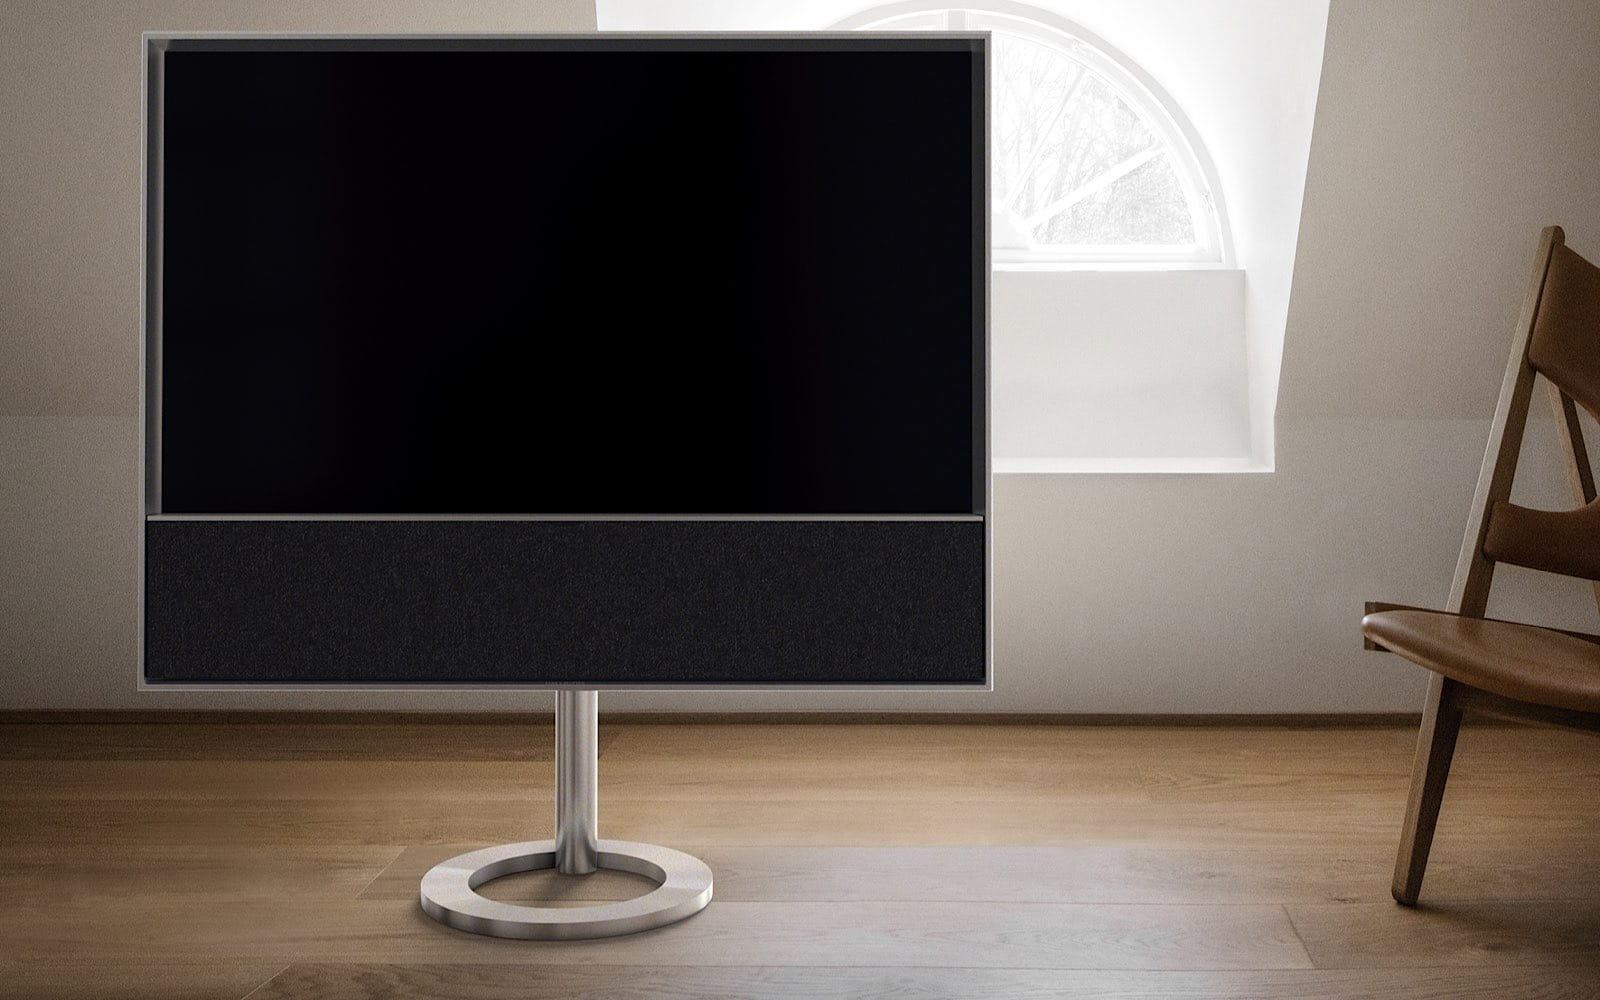 Bang & Olufsen 55 inch Contour TV